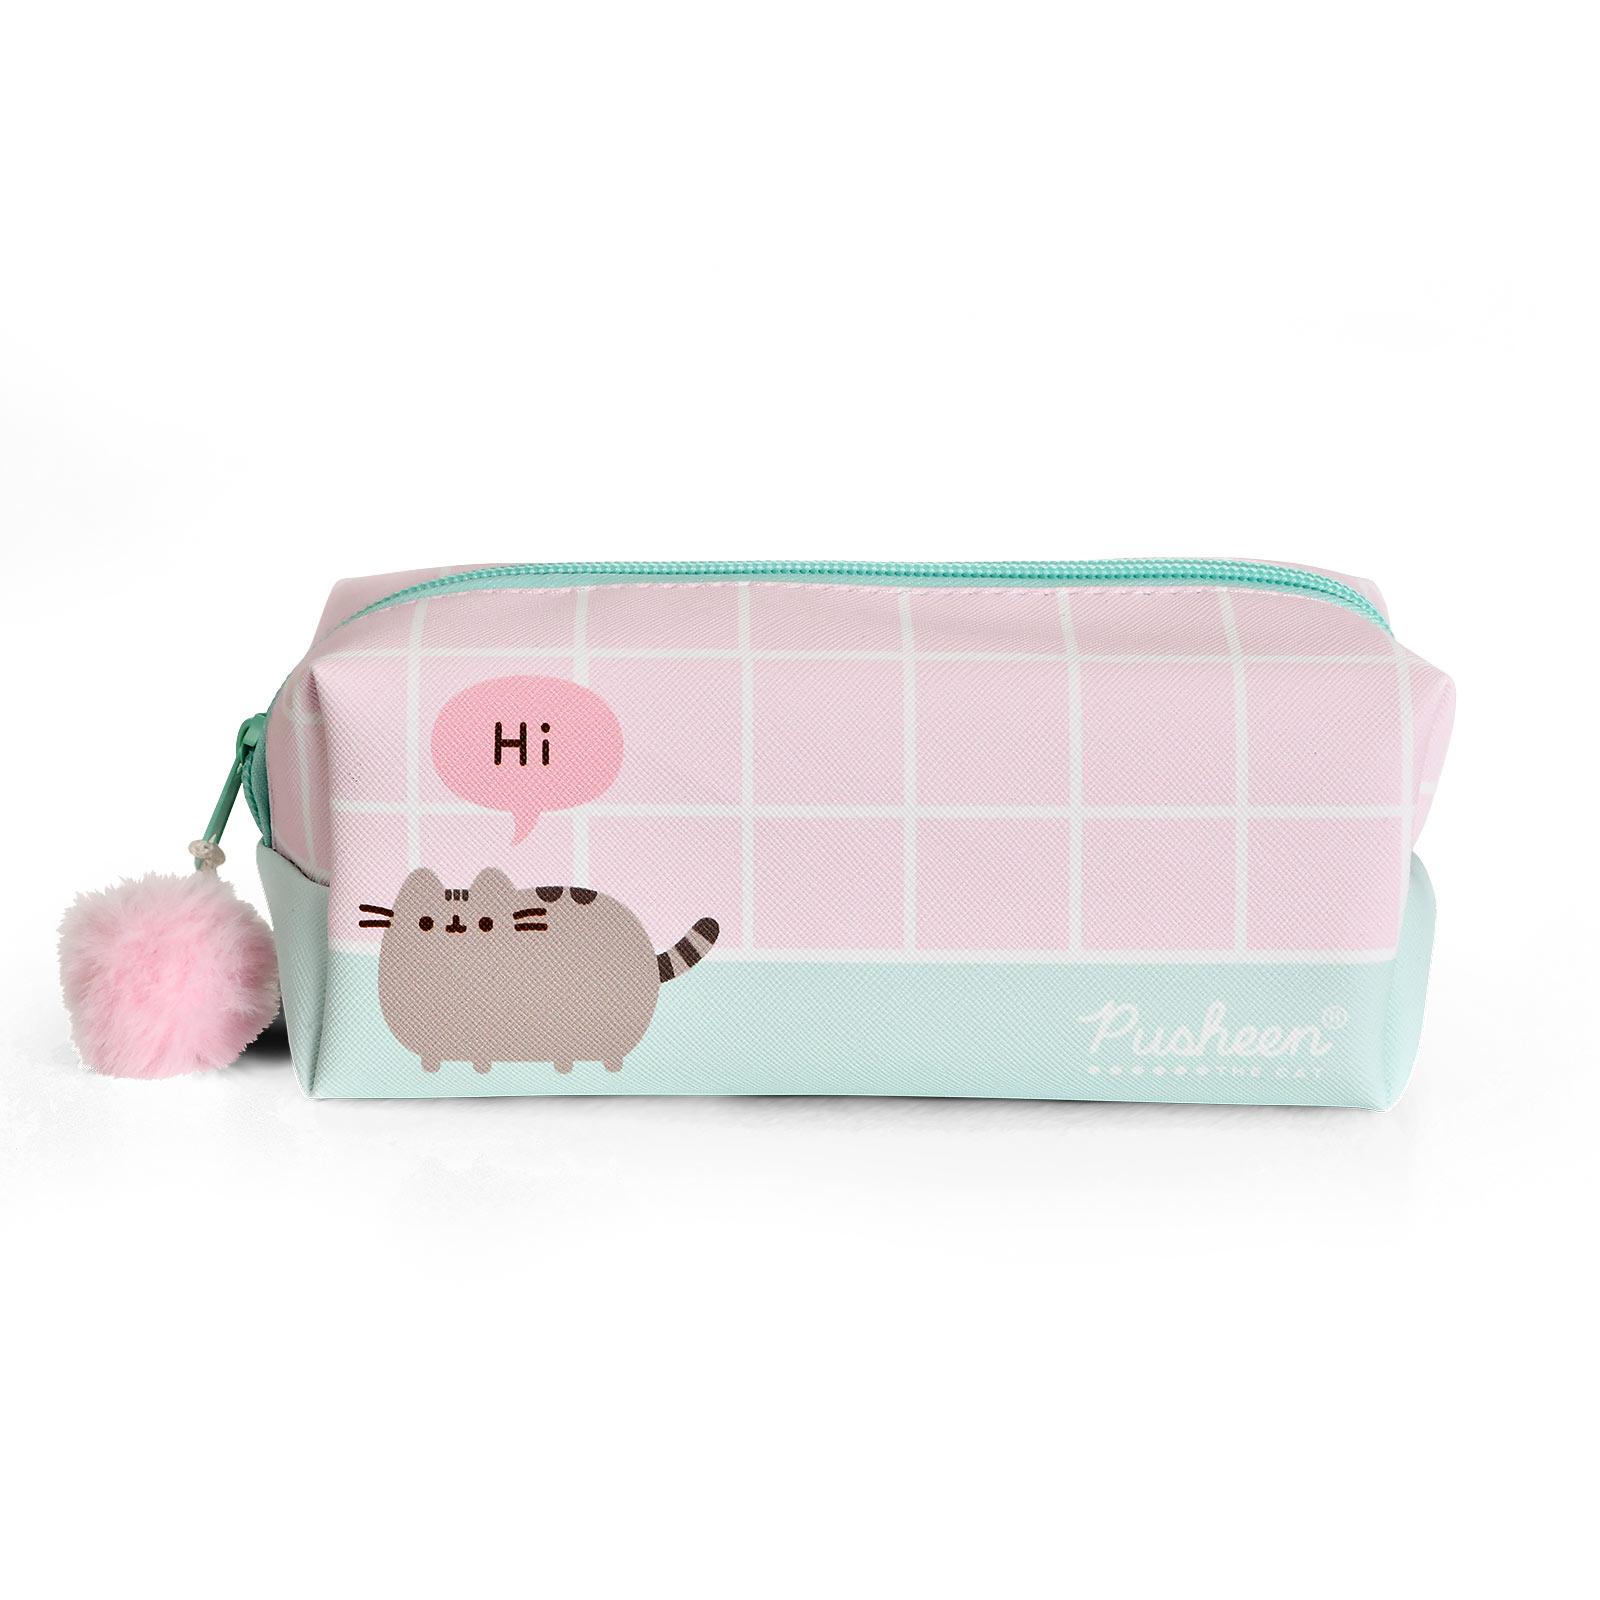 Pusheen - Kosmetiktasche